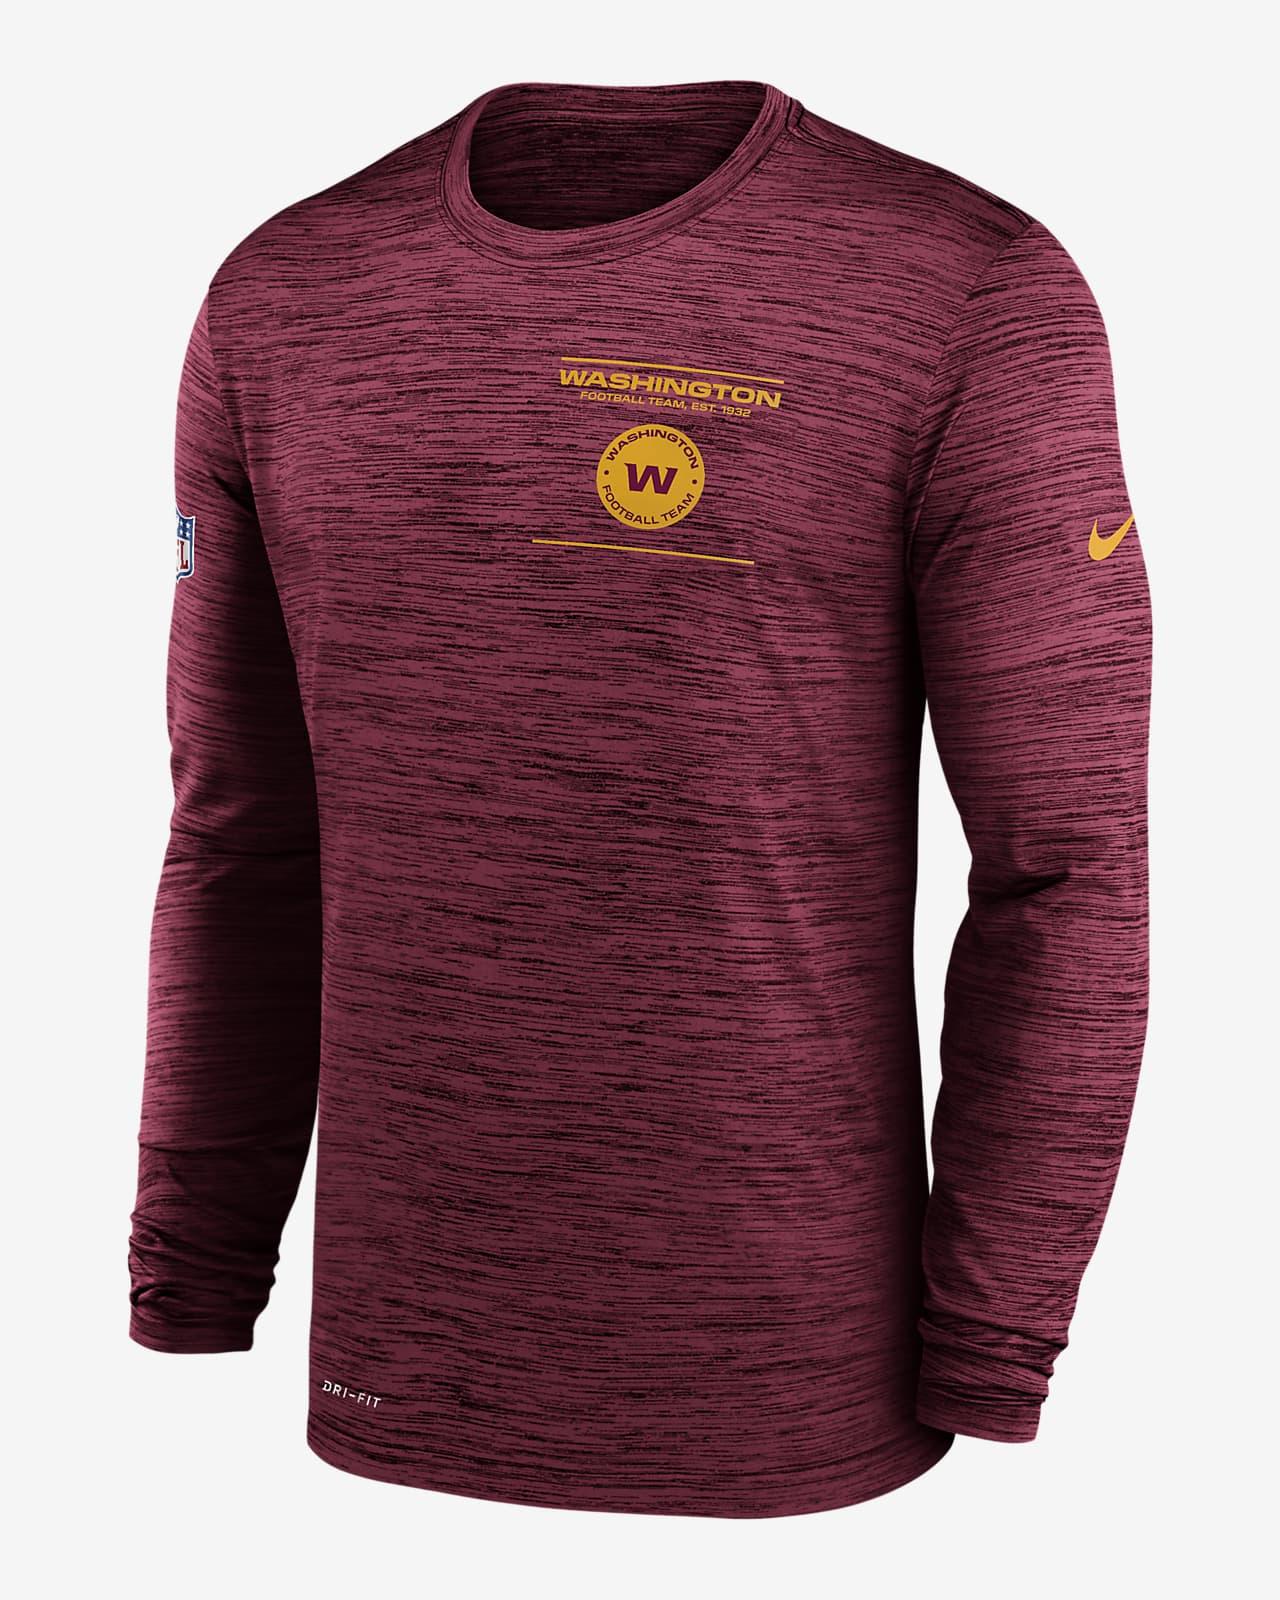 Nike Dri-FIT Sideline Velocity Legend (NFL Washington Football Team) Men's Long-Sleeve T-Shirt